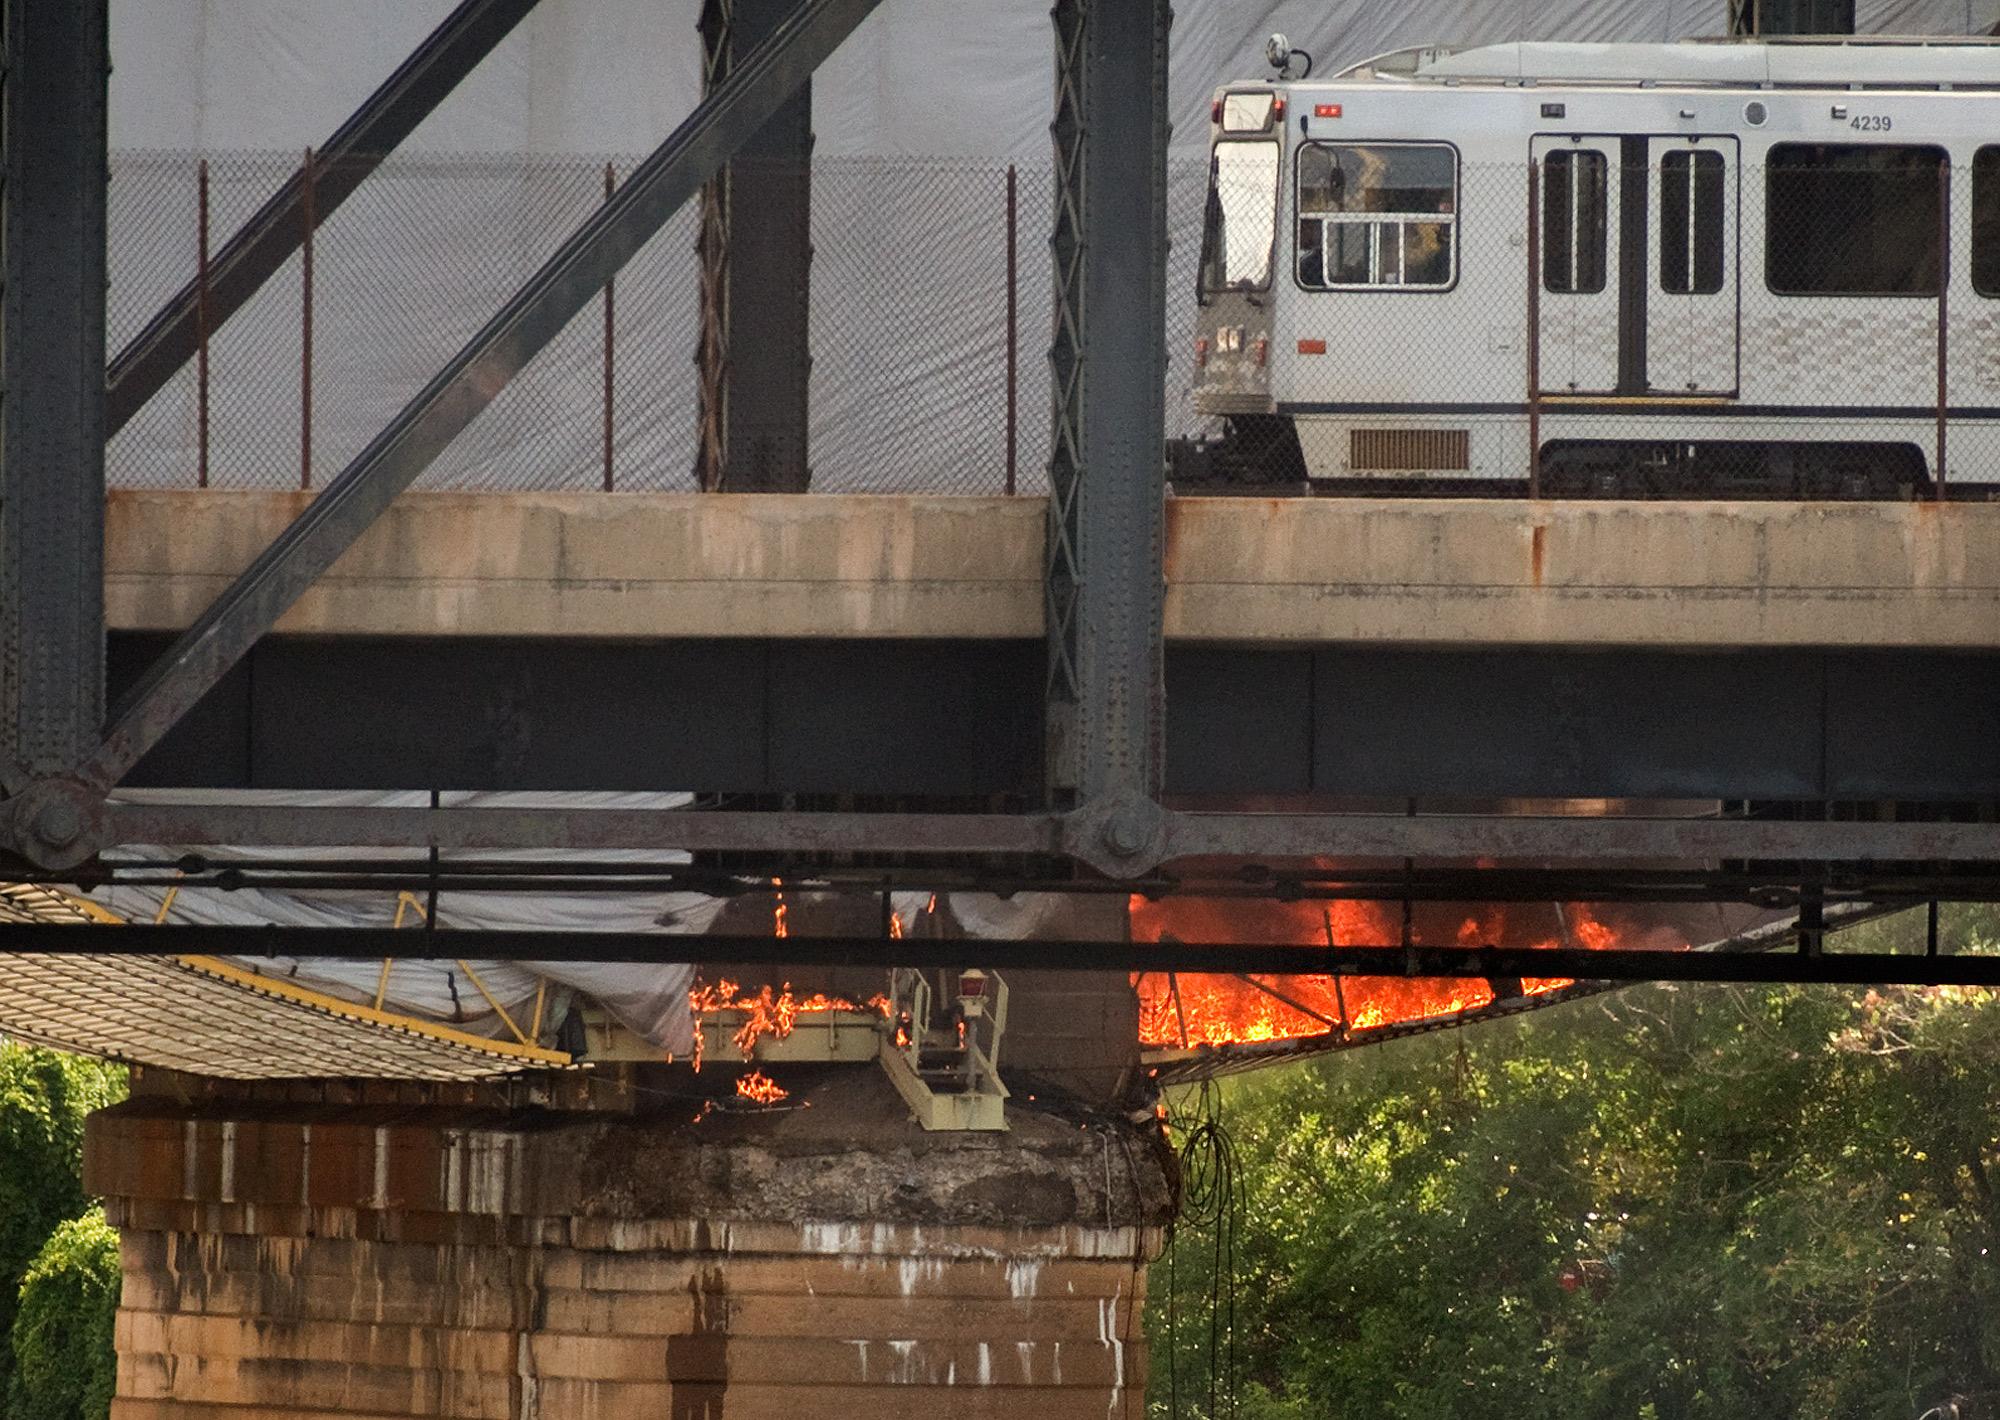 A light rail vehicle pauses the watch the tarp fire on Friday, Sept. 2, 2016. (Steve Mellon/Post-Gazette)